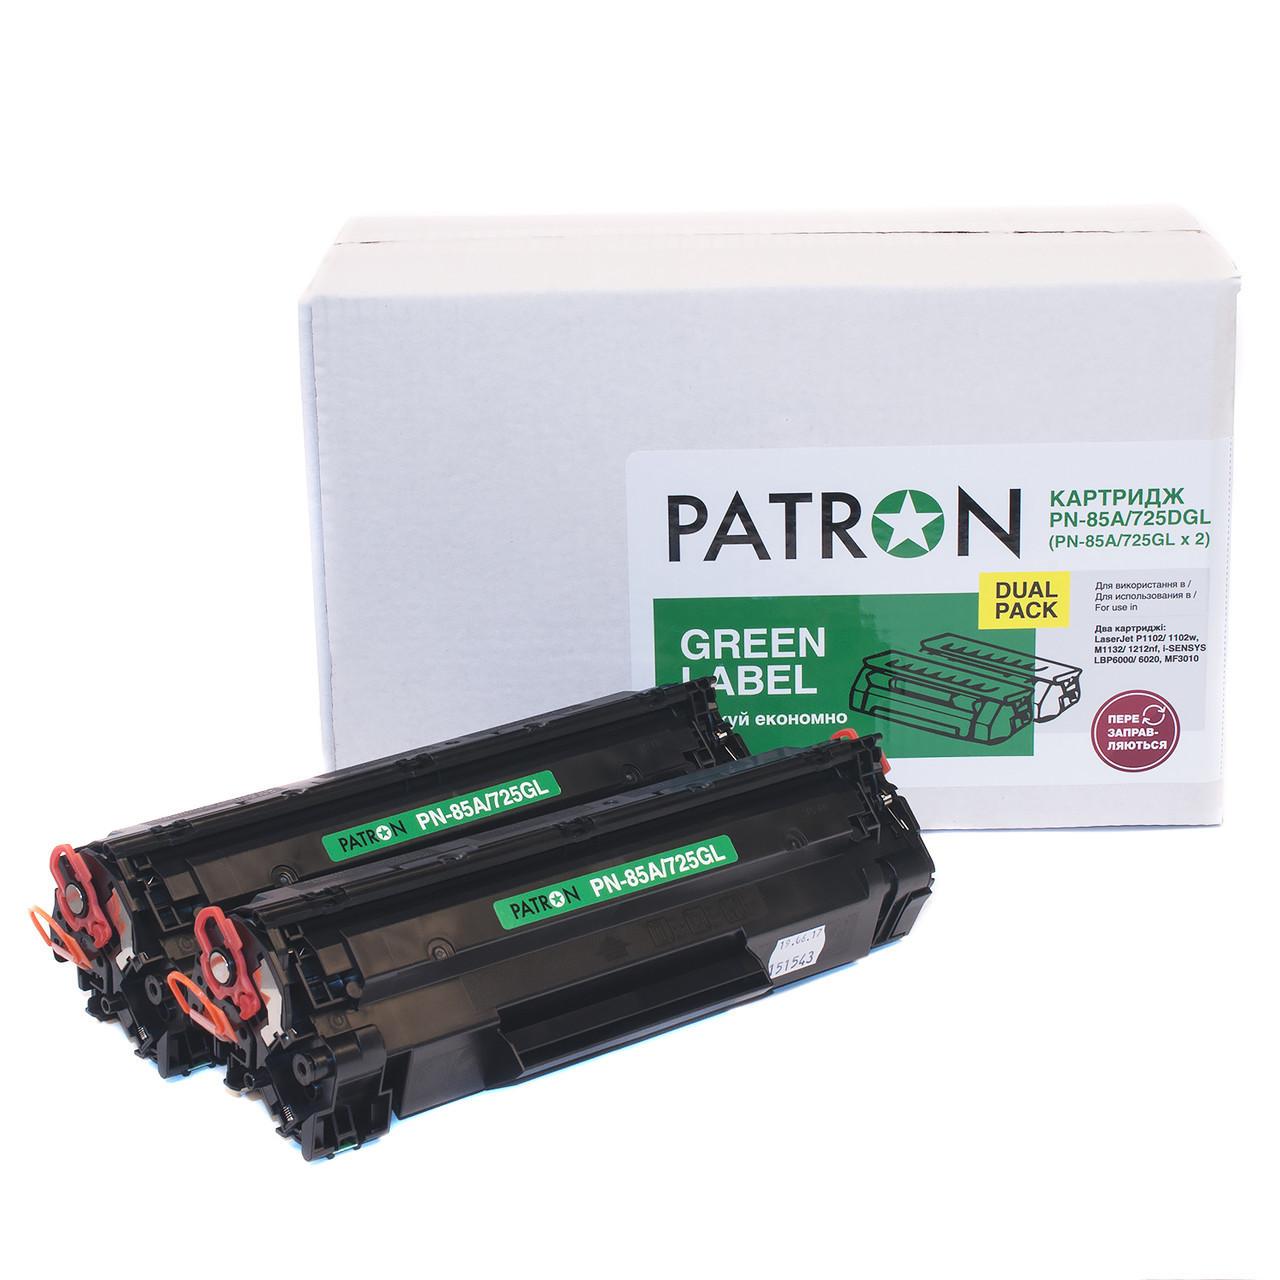 Комплект 2 картриджа Canon 725, Black, LBP-6000/6020, MF3010, ресурс 1600 листов, Patron